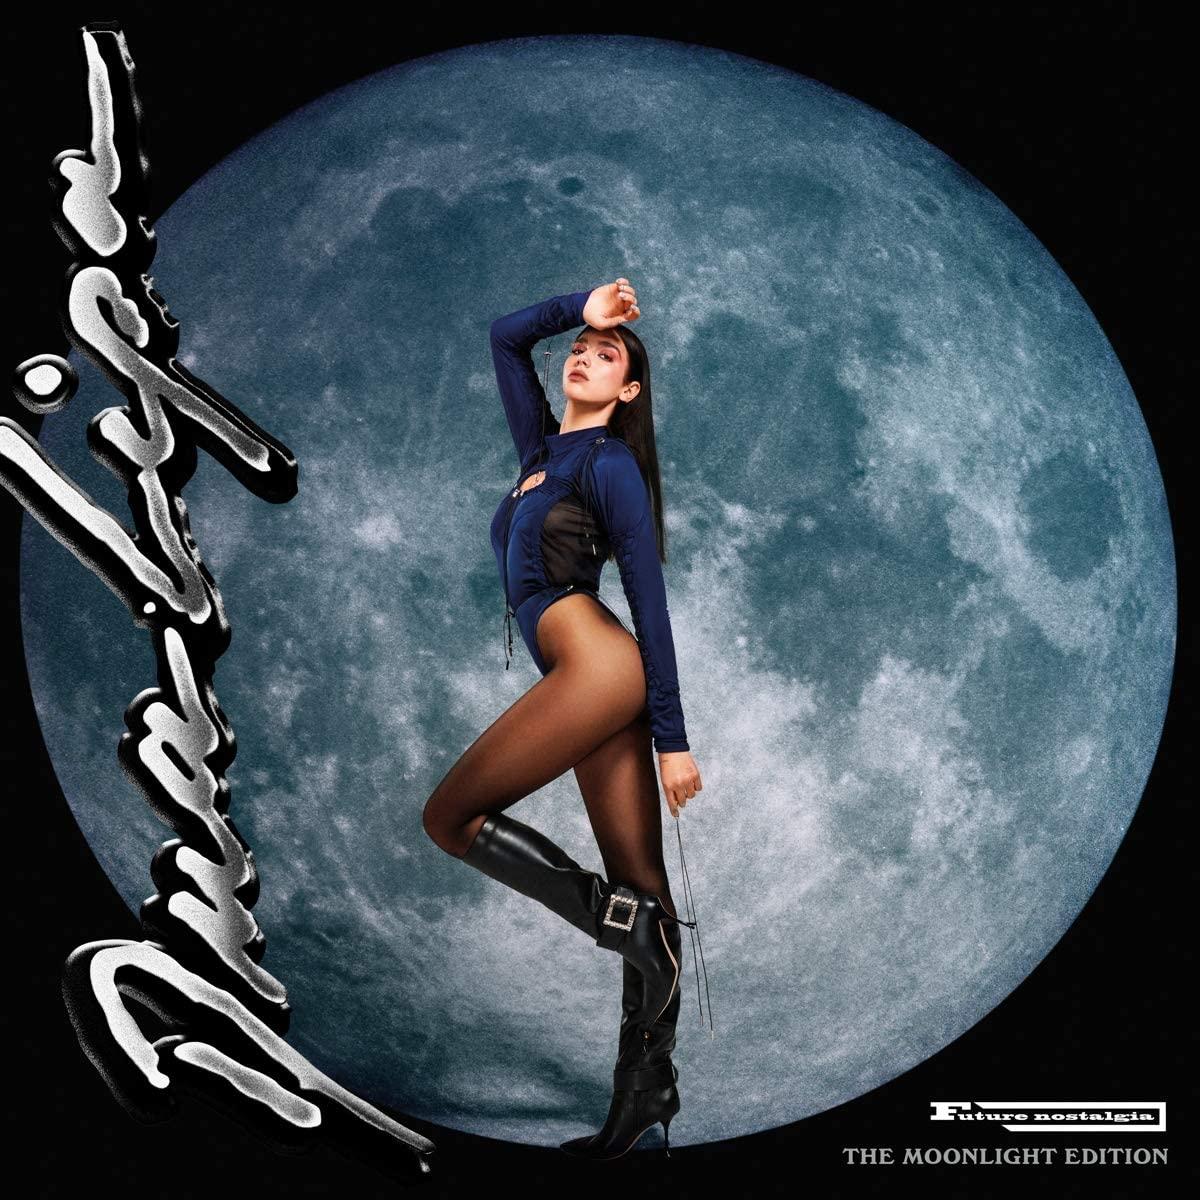 Dua Lipa - Future Nostalgia (The Moonlight Edition) [2xLP]